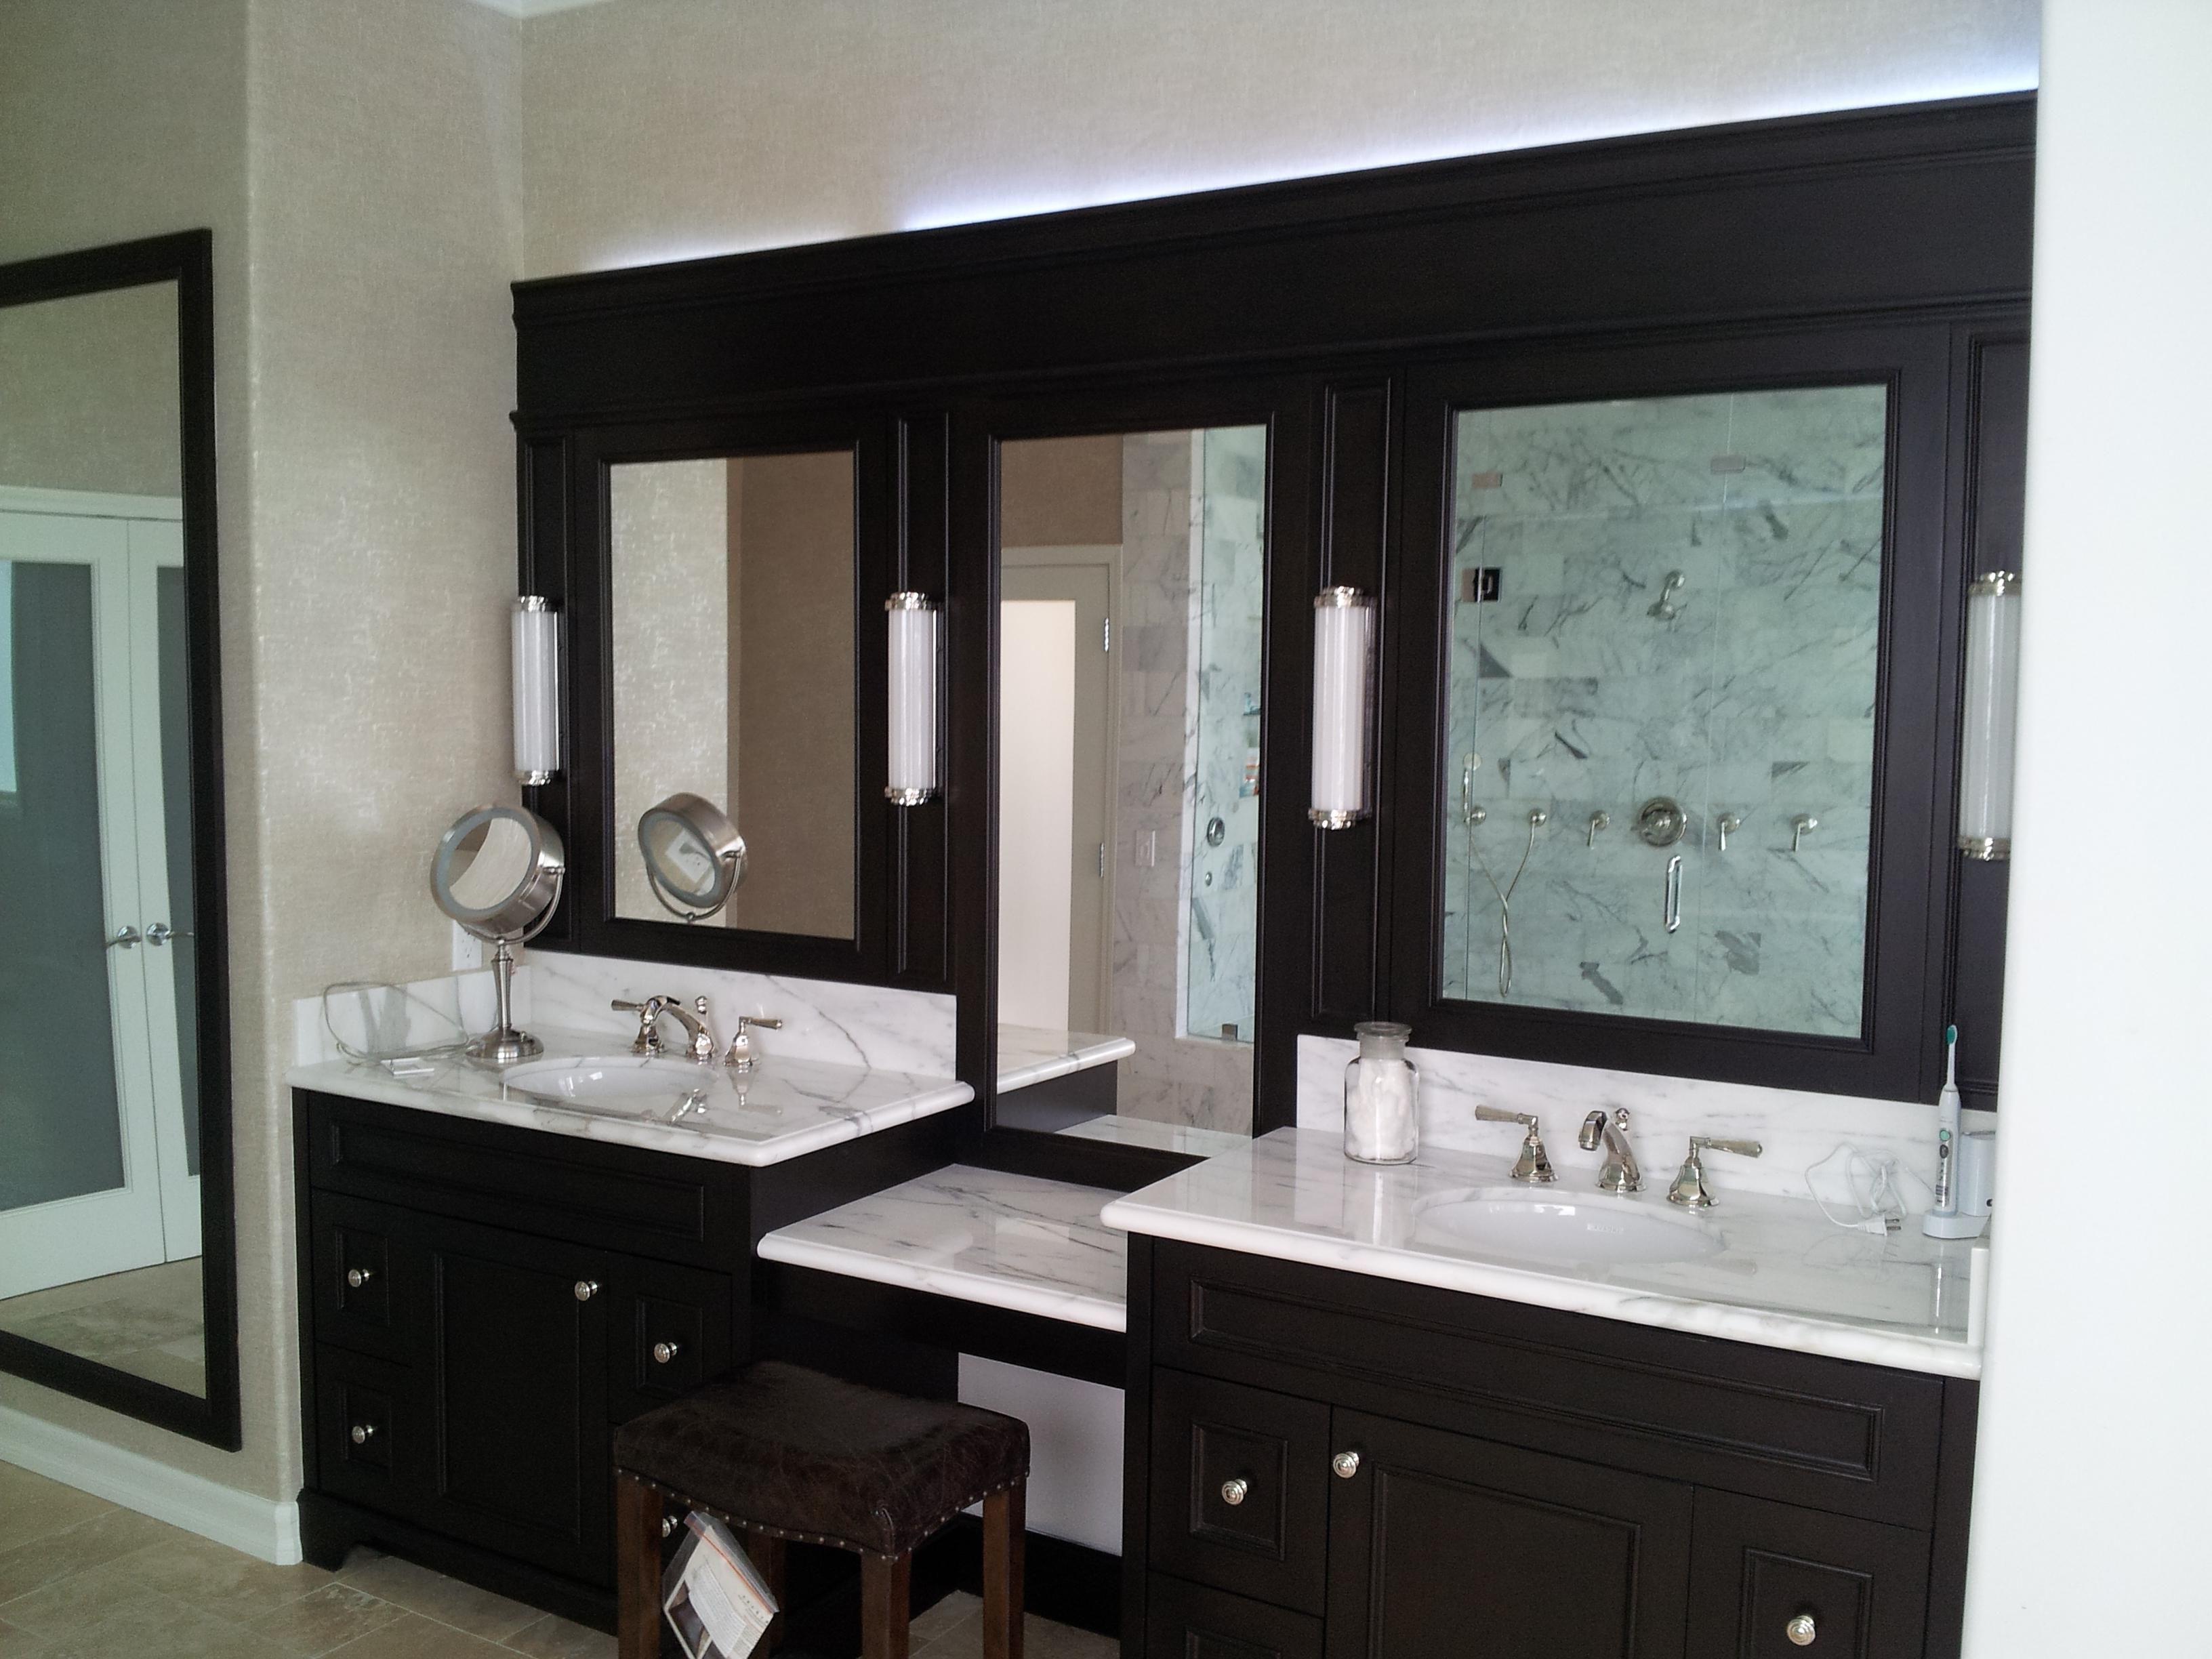 Furniture Astounding Ideas Black And White Double Sink Bathroom Vanity With Mirror Makeup Area Al Home Depot Bathroom Fancy Bathroom Modern Bathroom Vanity